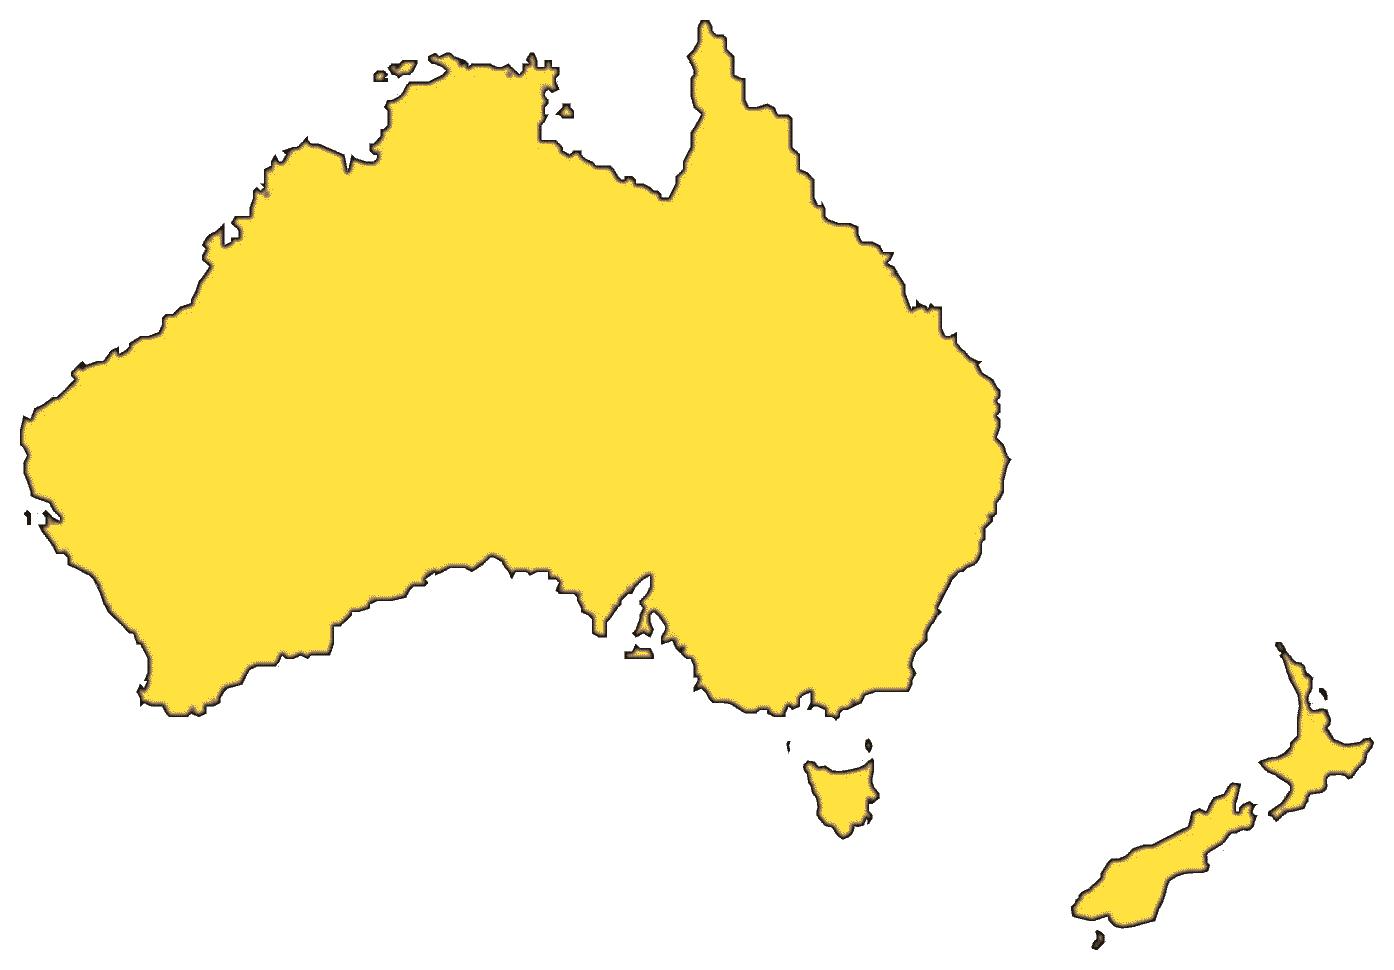 Australia Map Png.Download Australia Map File Hq Png Image Freepngimg